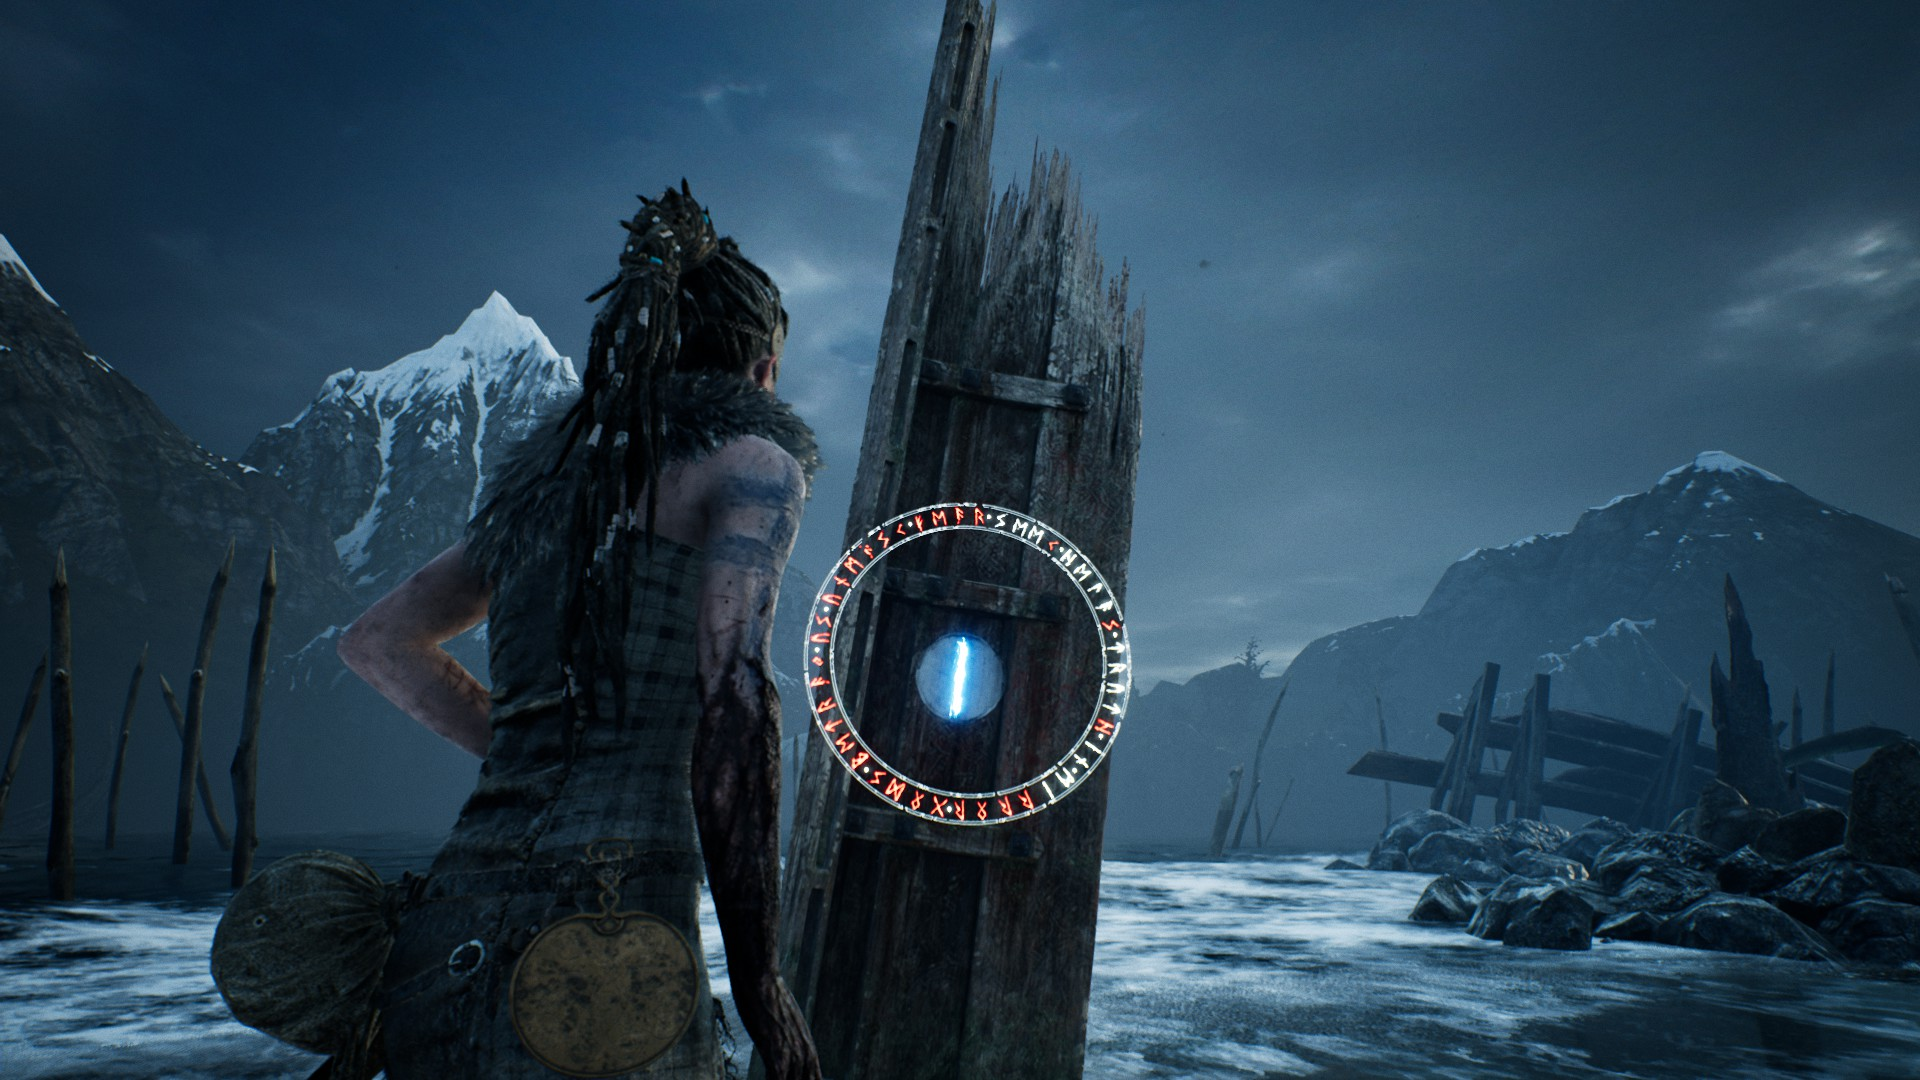 Mythologie Nordique Hellblade : Senua's Sacrifice